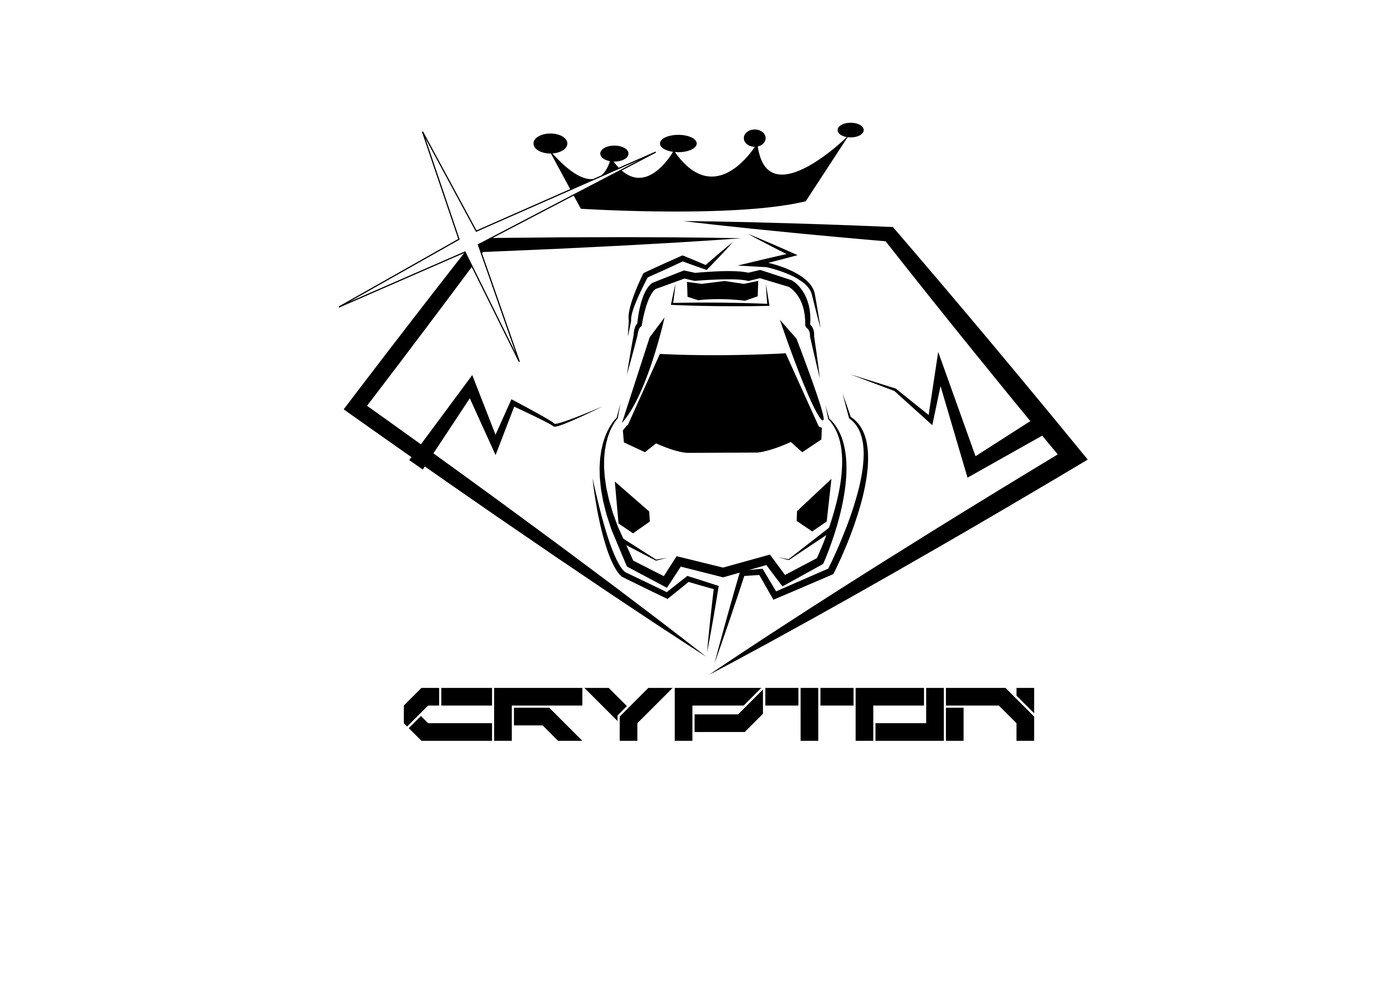 Car Detailing Logo By Ivan Oroz At Coroflot Com